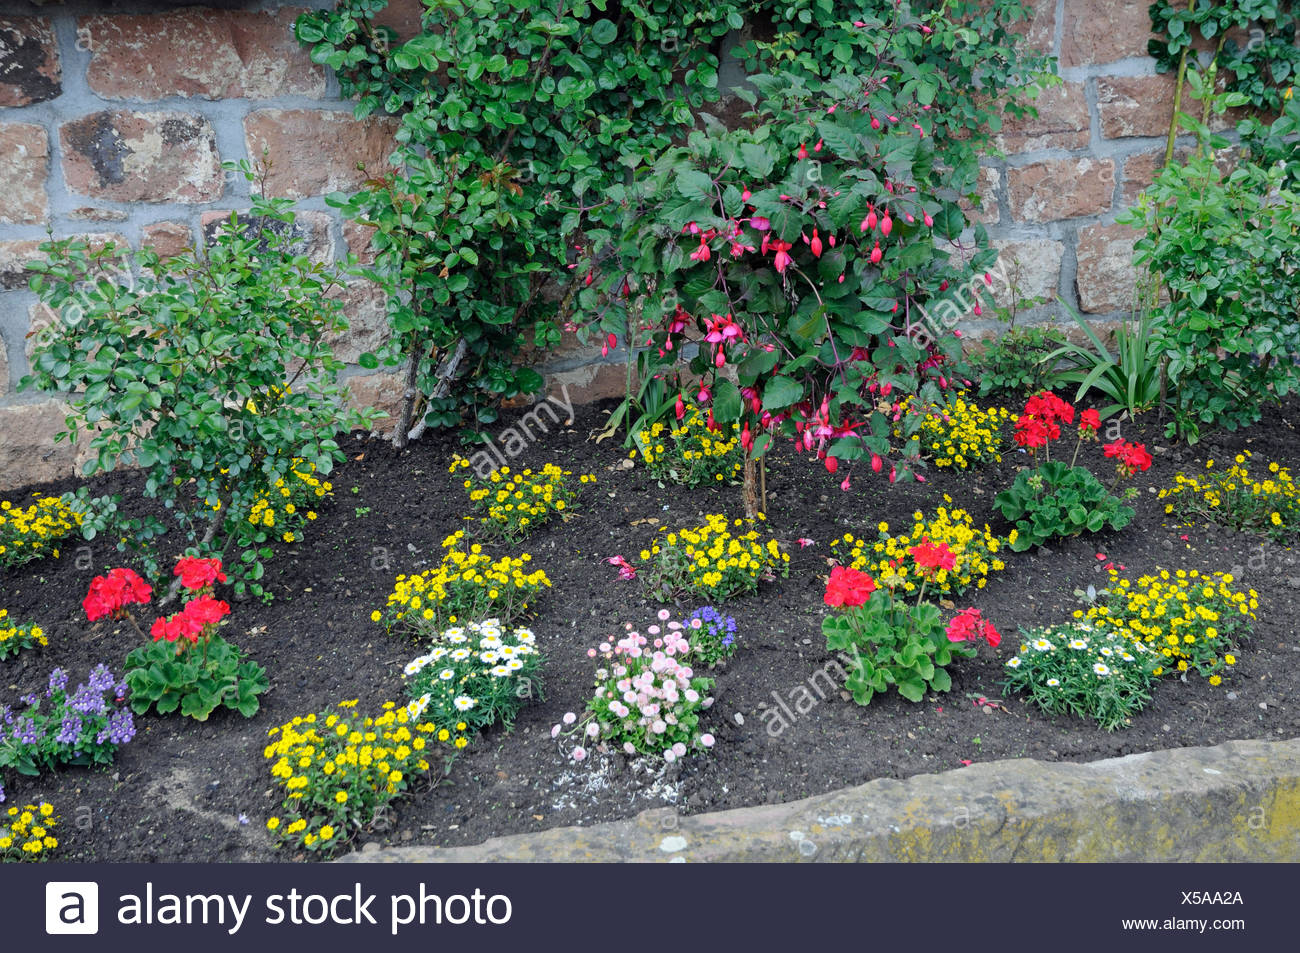 blumenrabatte rabatte blumen zierpflanzen garten park blumenbeet stadtmauer mauer eberbach frhling frhjahr X5AA2A